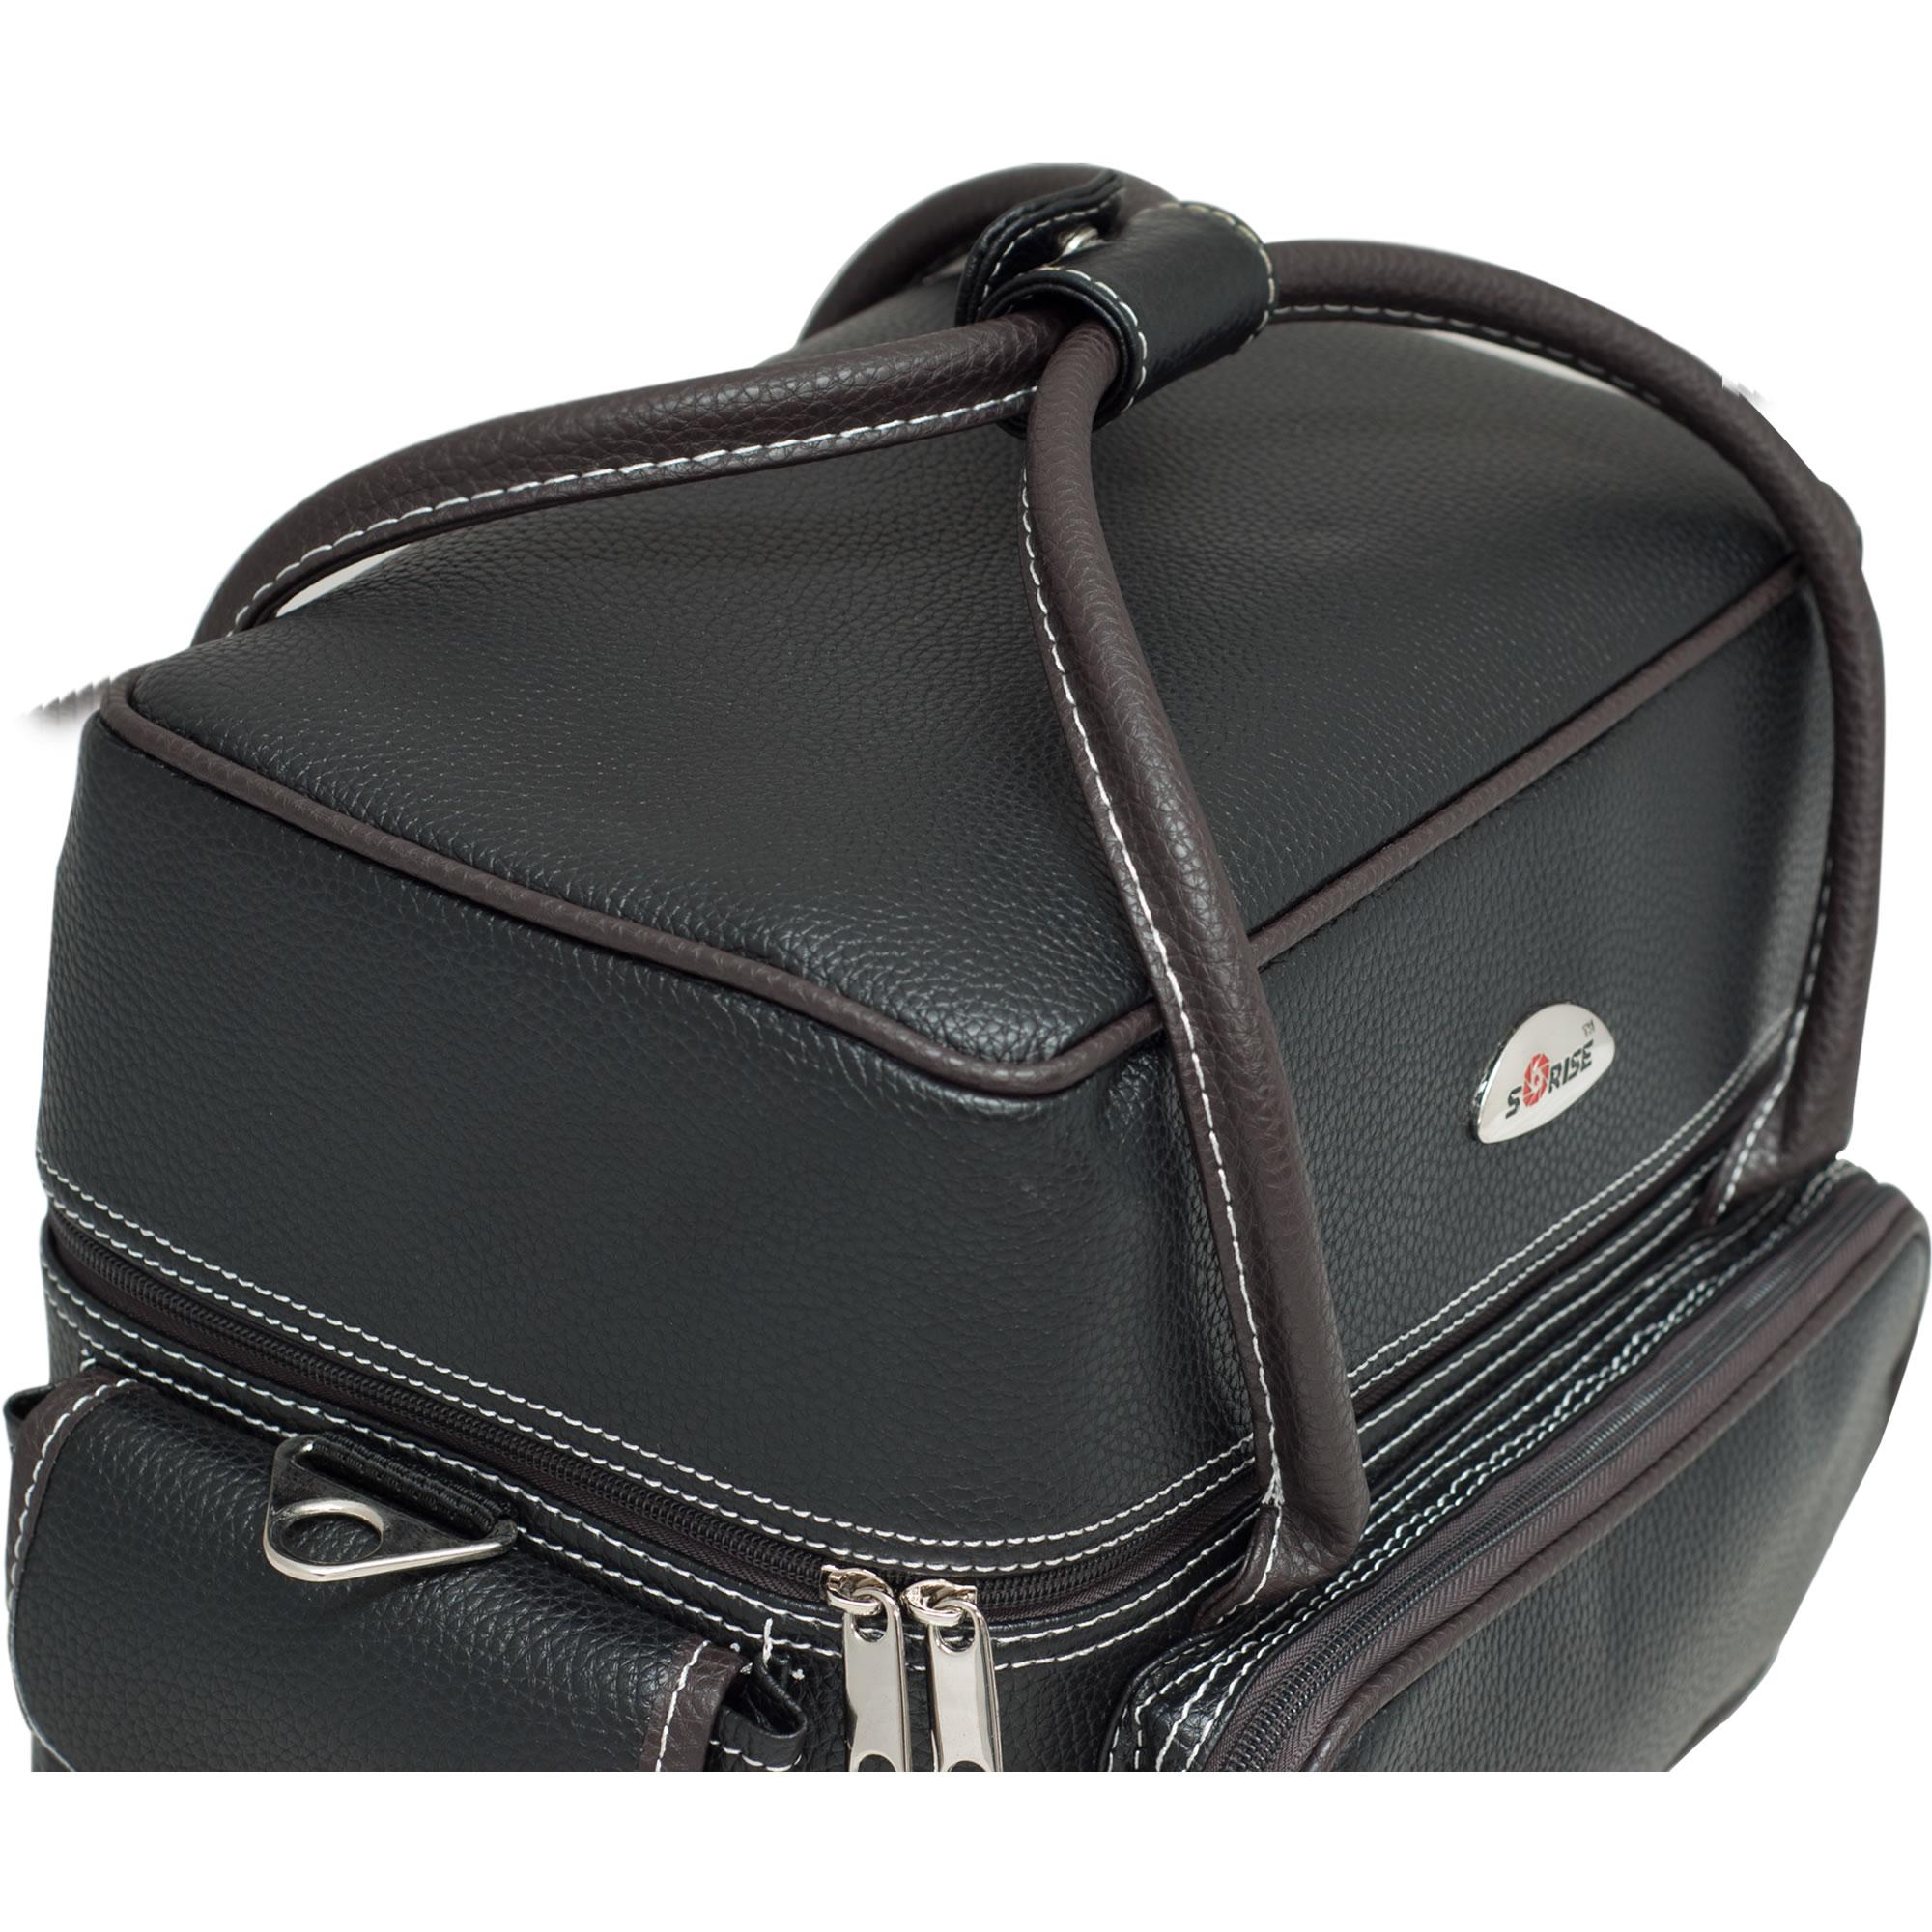 Sunrise Black Soft Leatherette Nail Tech Artist Travel Case C3027